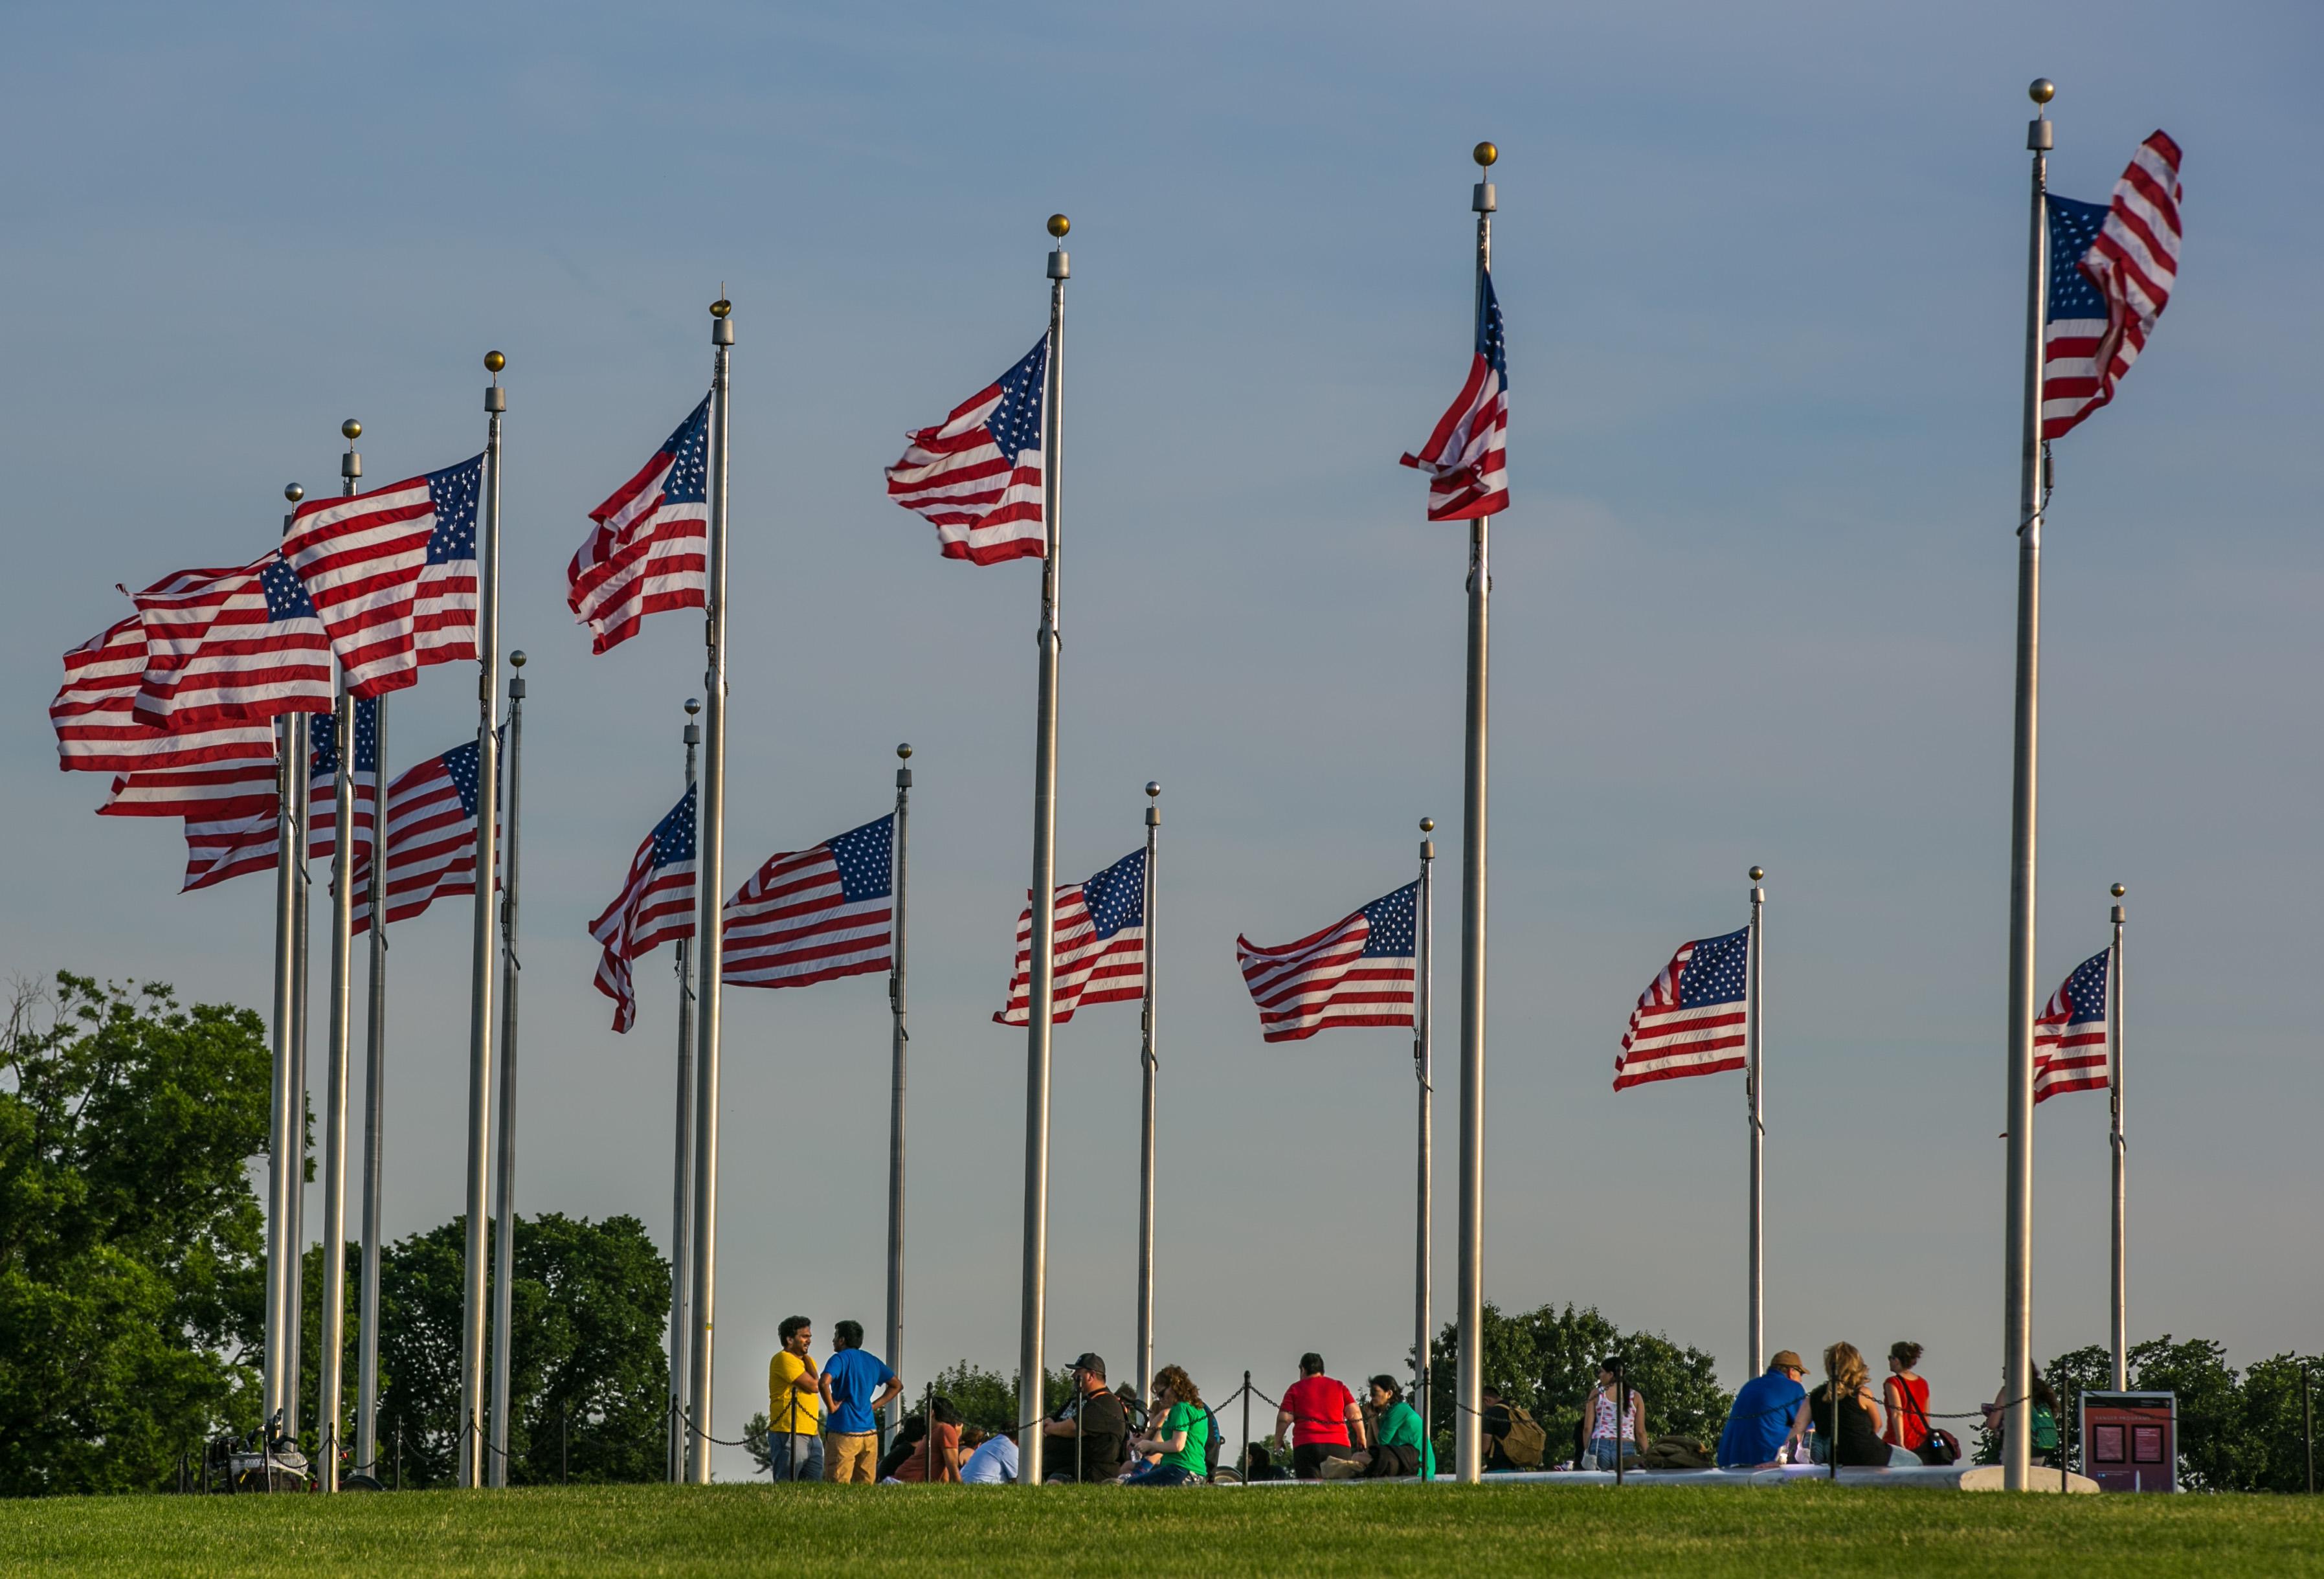 Exploring Our Nation's Capital: Washington D.C.